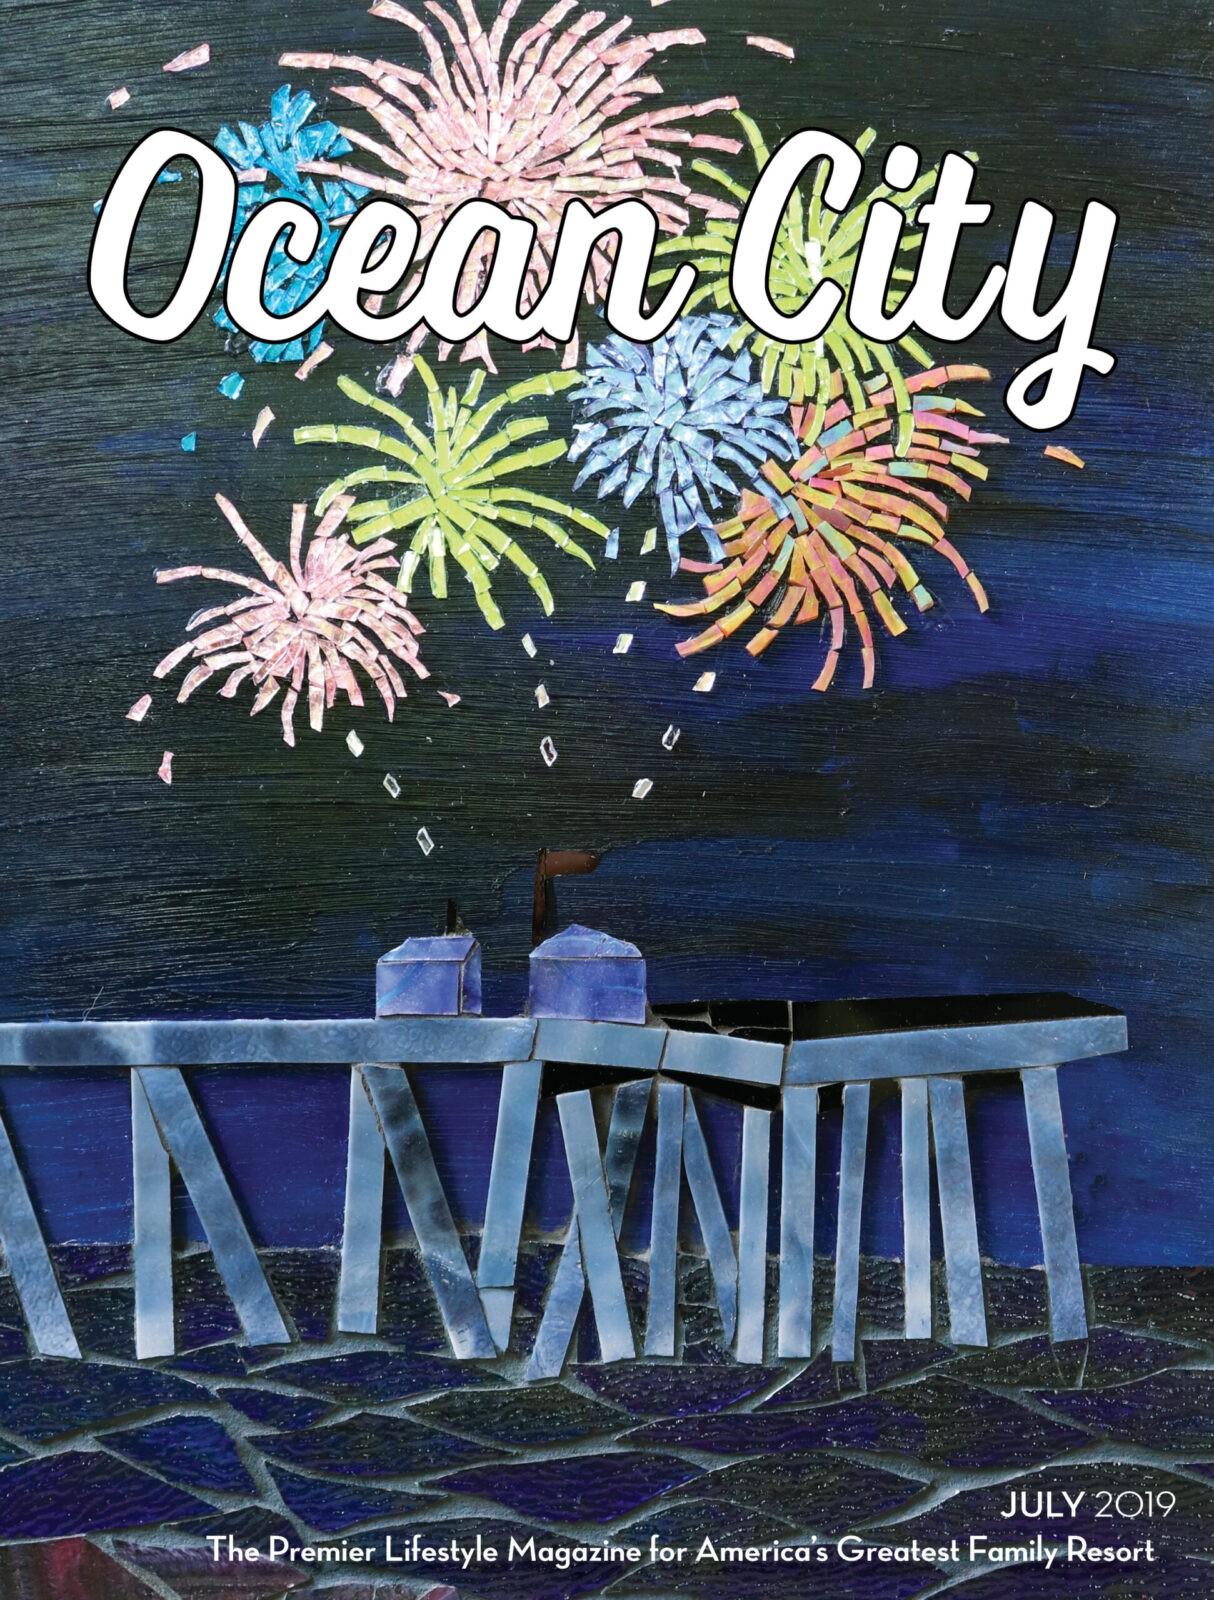 July 2019 Ocean City magazine